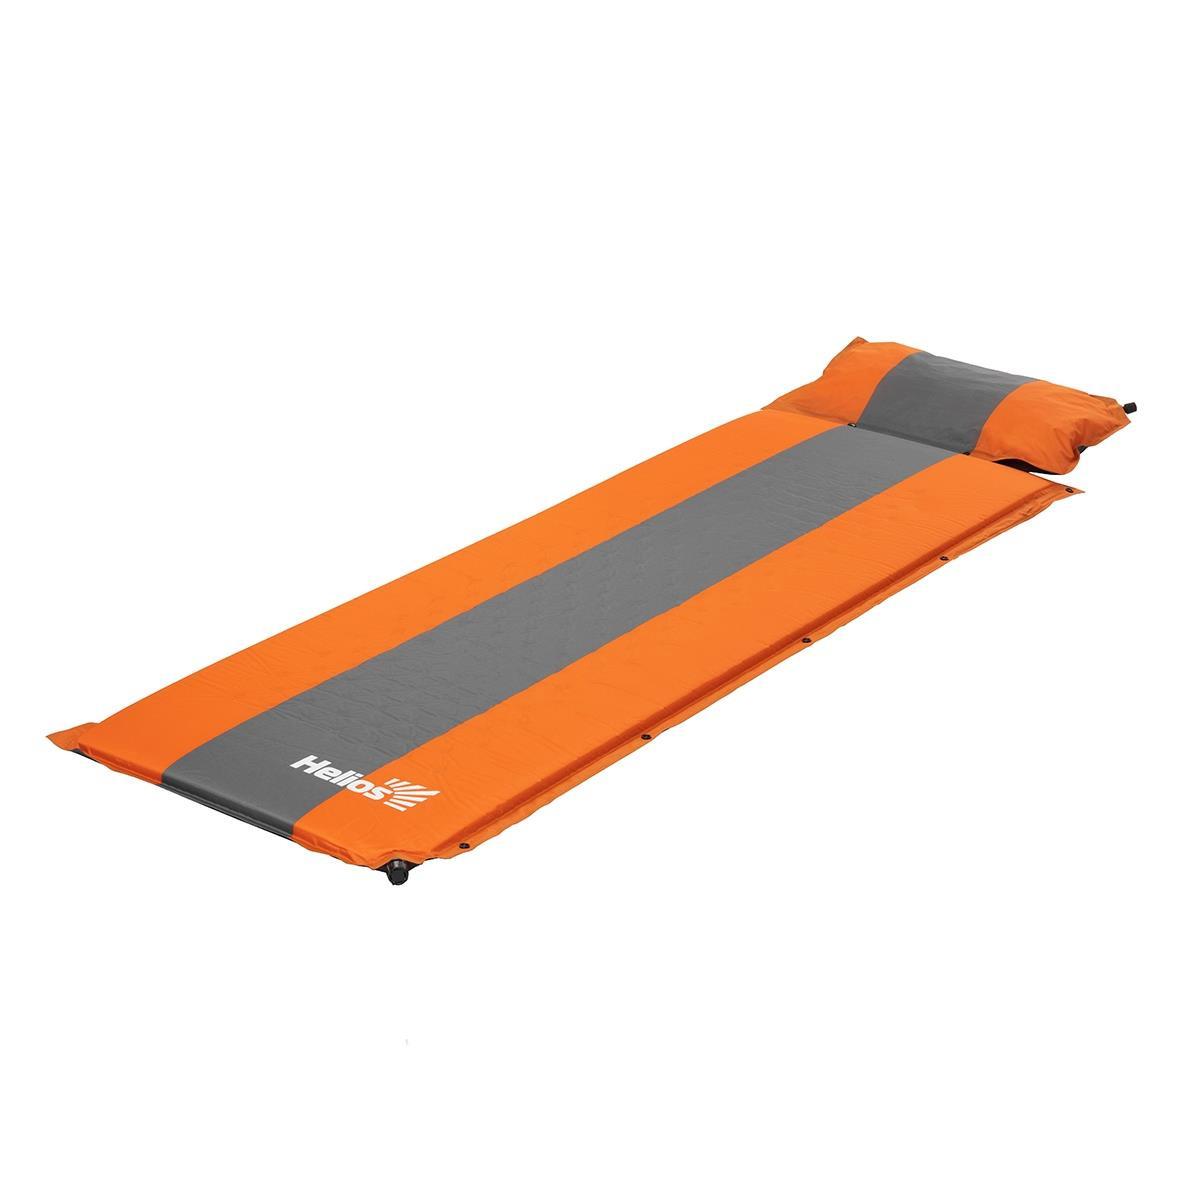 Коврик самонадувающийся с подушкой (HS-004P)